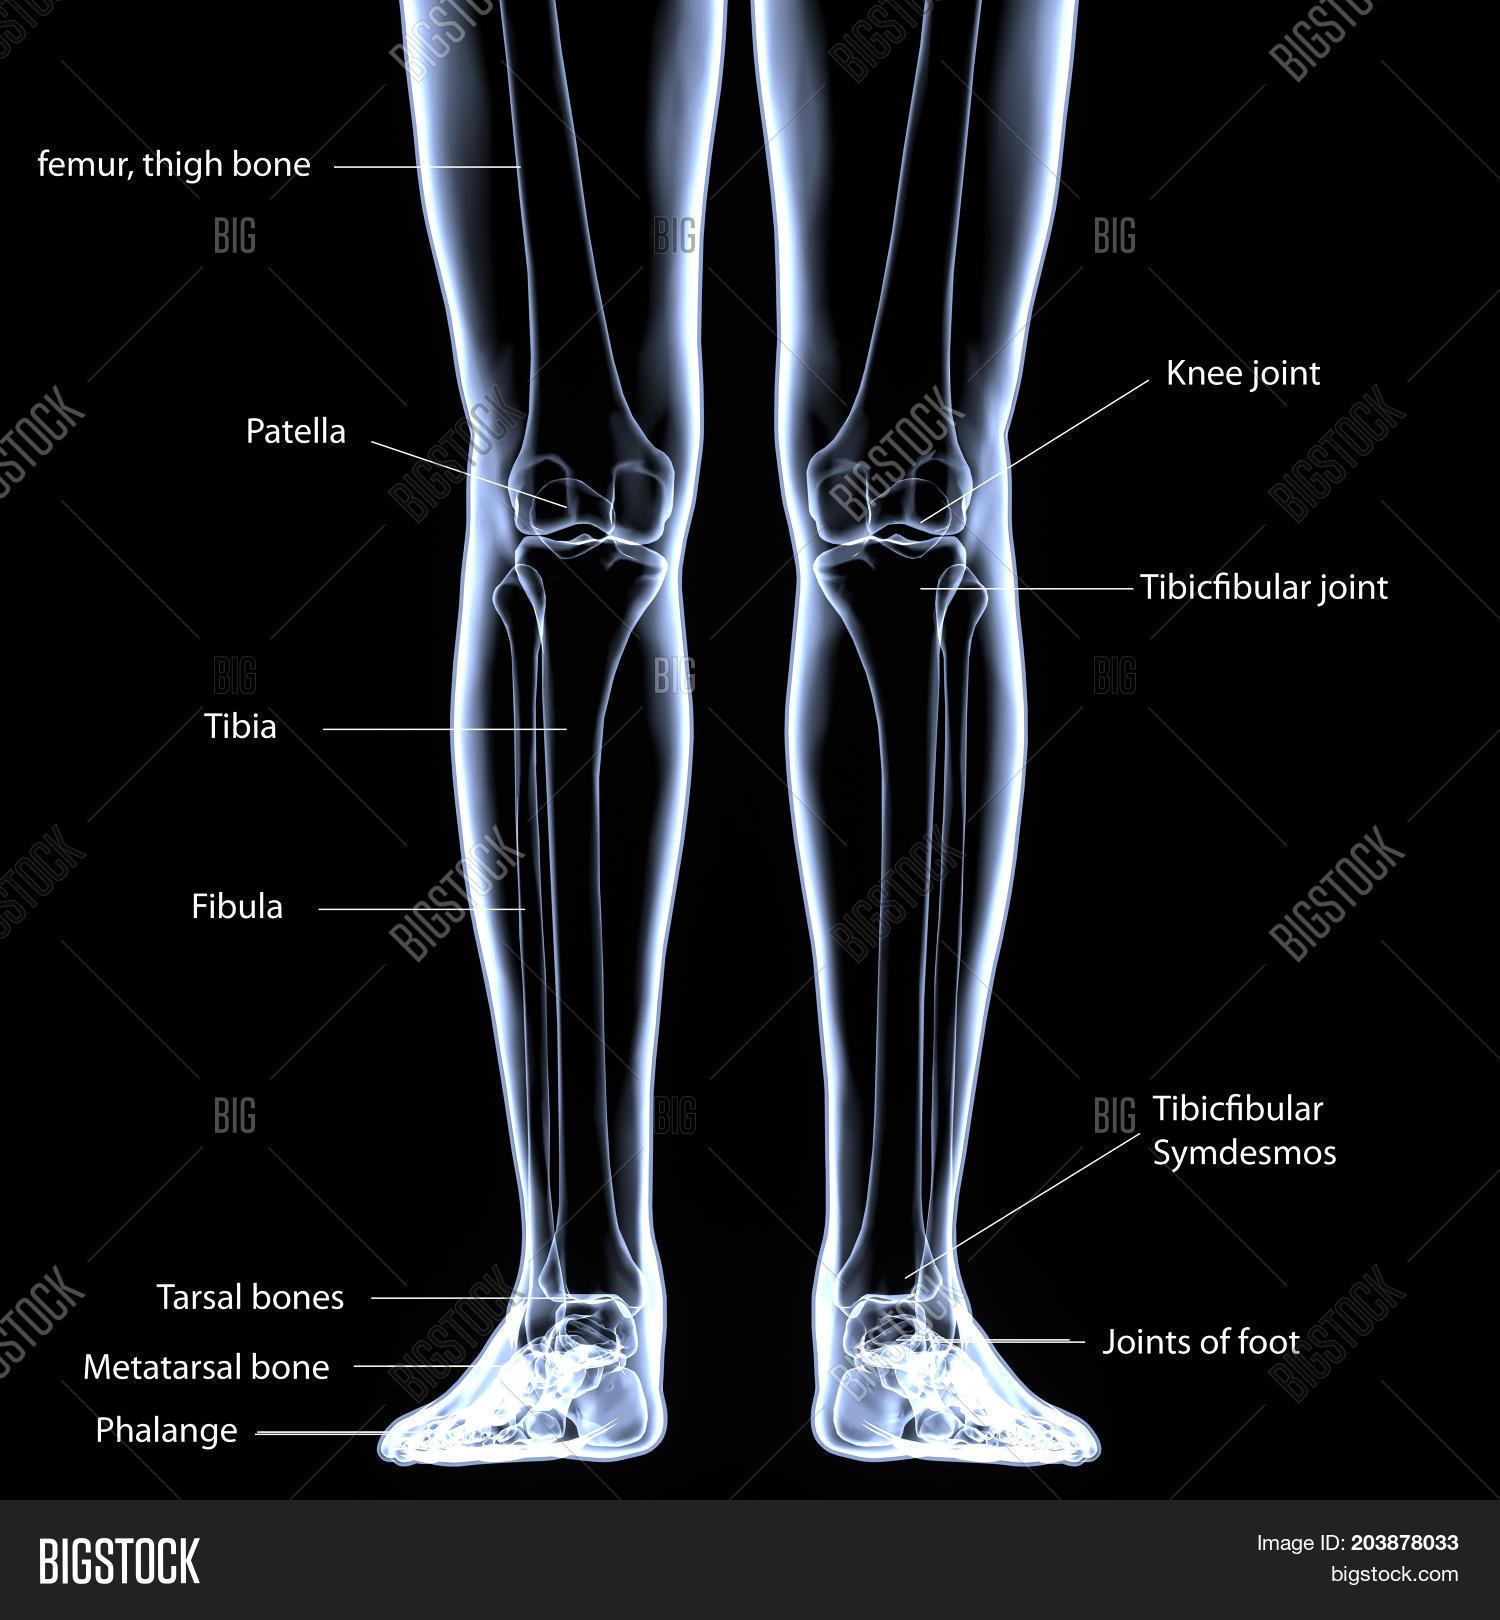 Human Foot Anatomy Illustration . Image & Photo | Bigstock